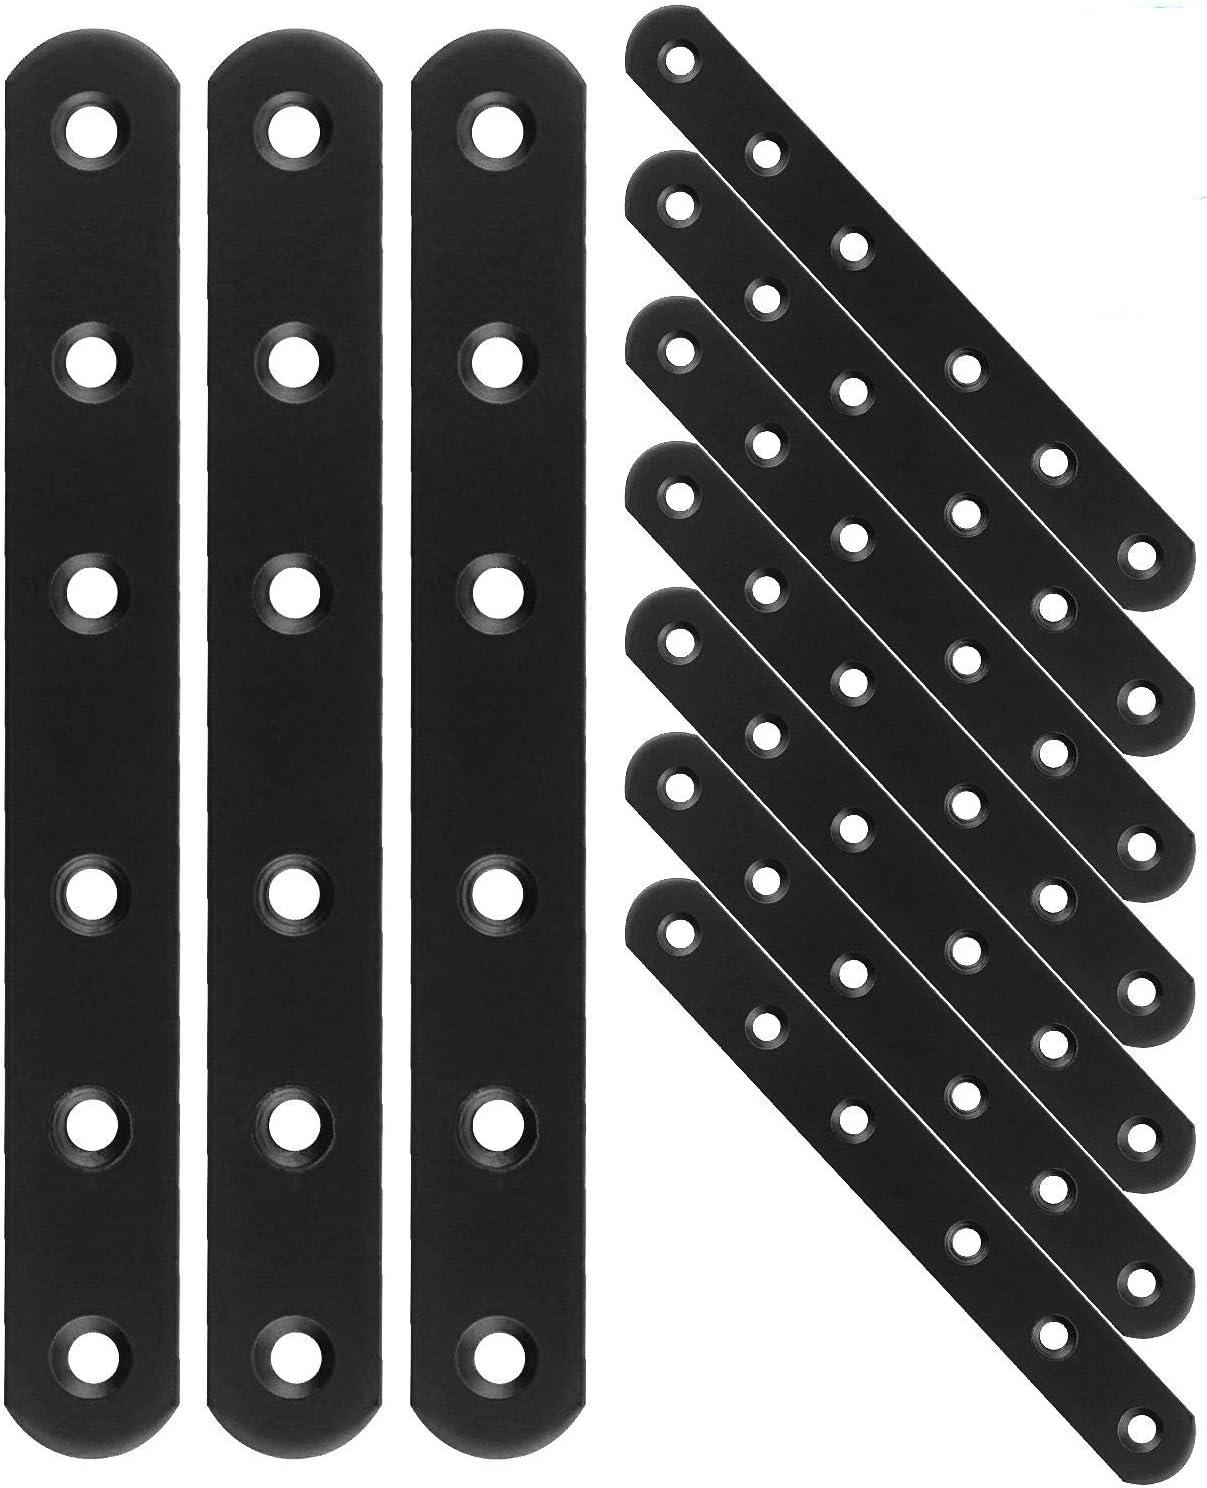 "20PCS Black Mending Plates, 6-1/4""Heavy Duty Iron Flat Corner Brace, Metal Straight Bracket Plate for Wooden Cabinet Bookshelves Bed Table, Fixing Furniture Fastener Hardware"